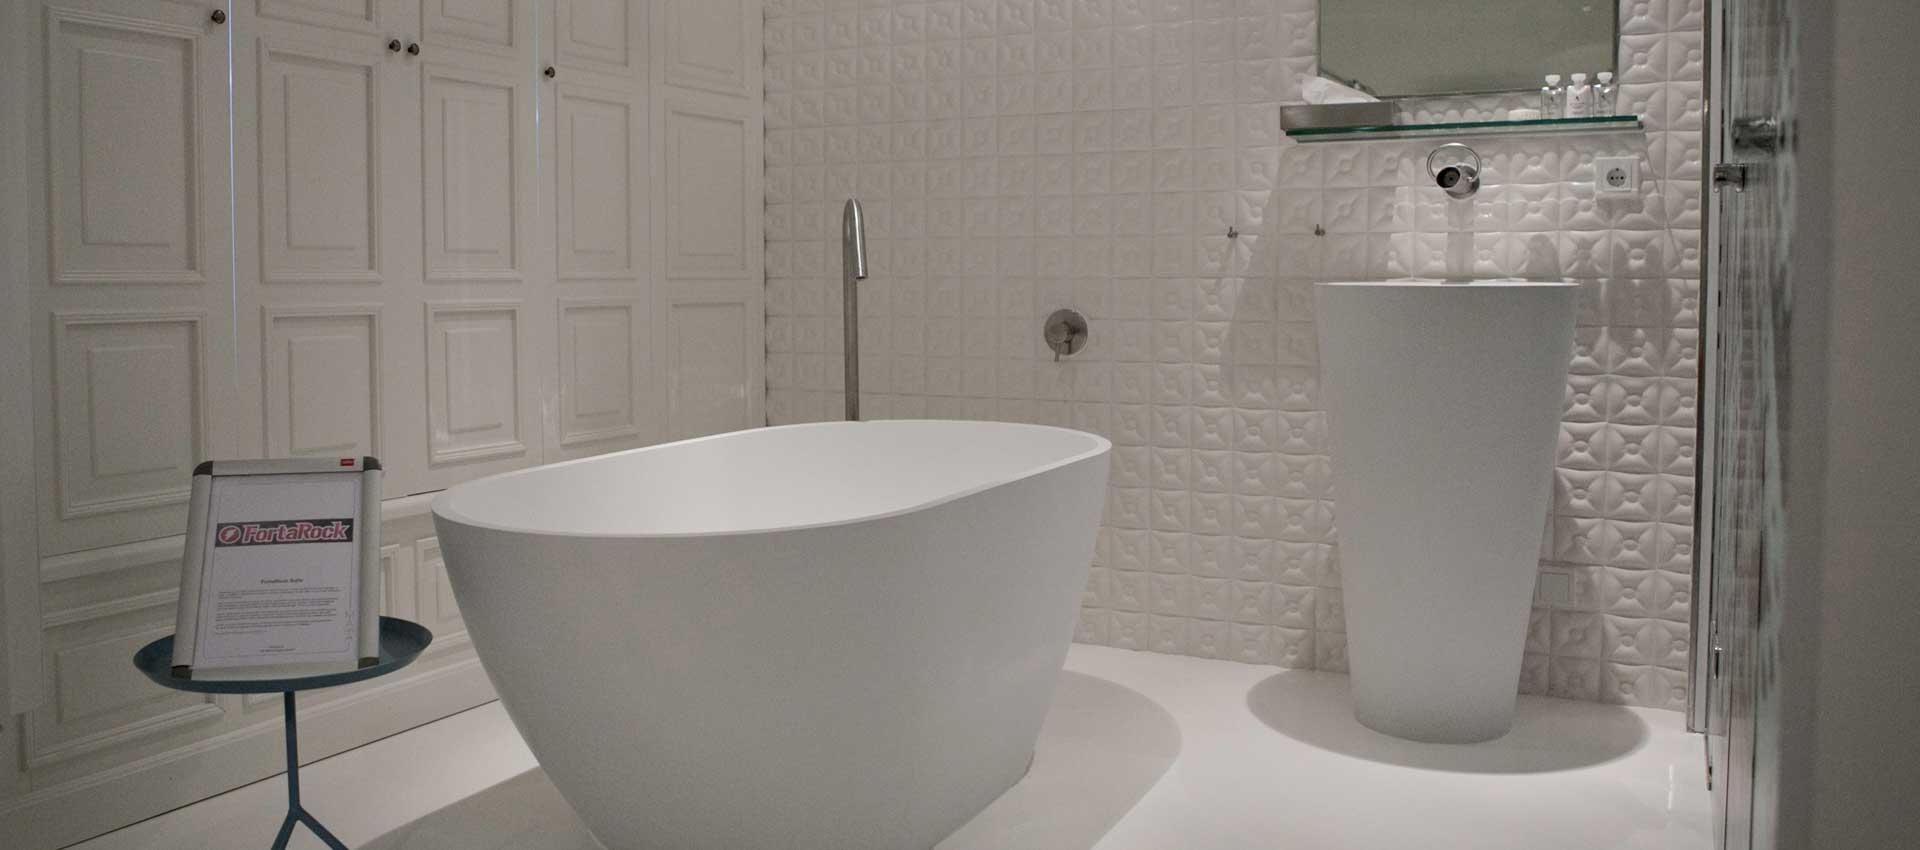 suite 07 L fortarock hotel manna nijmegen badkamer